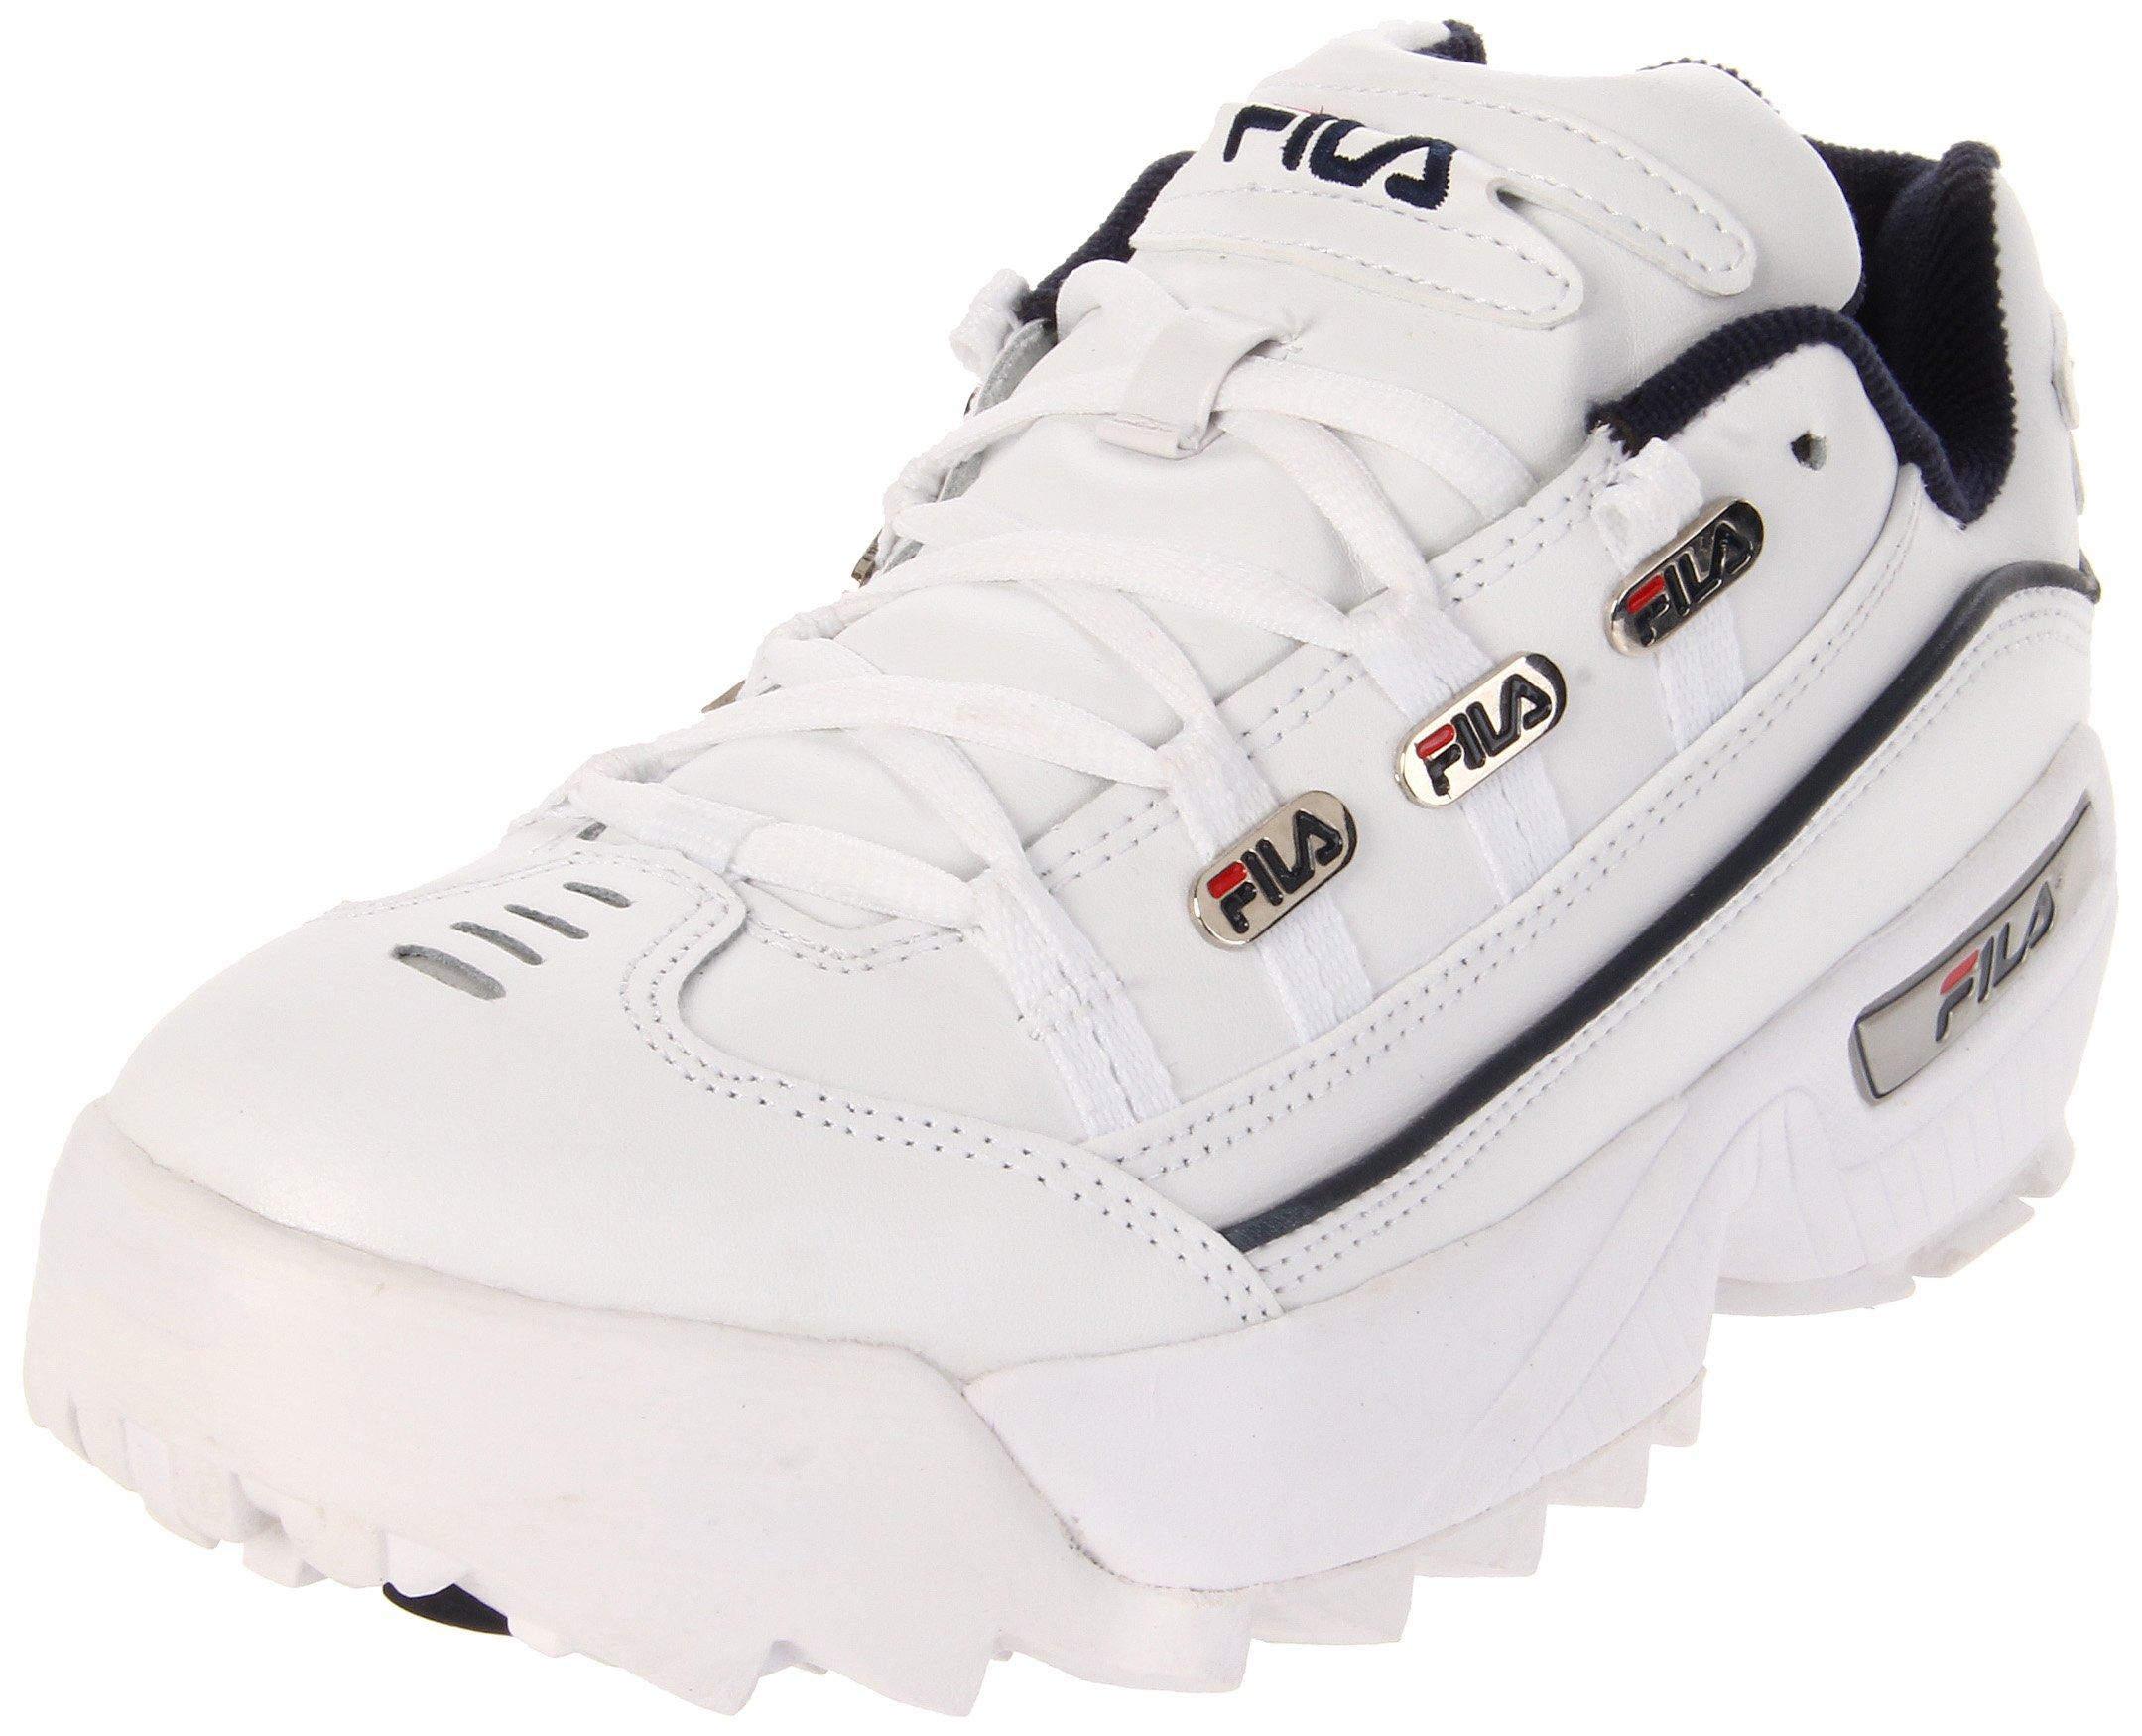 Fila Men's Hometown Extra Sneaker,White/Peacoat/Vintage Red,11.5 M US